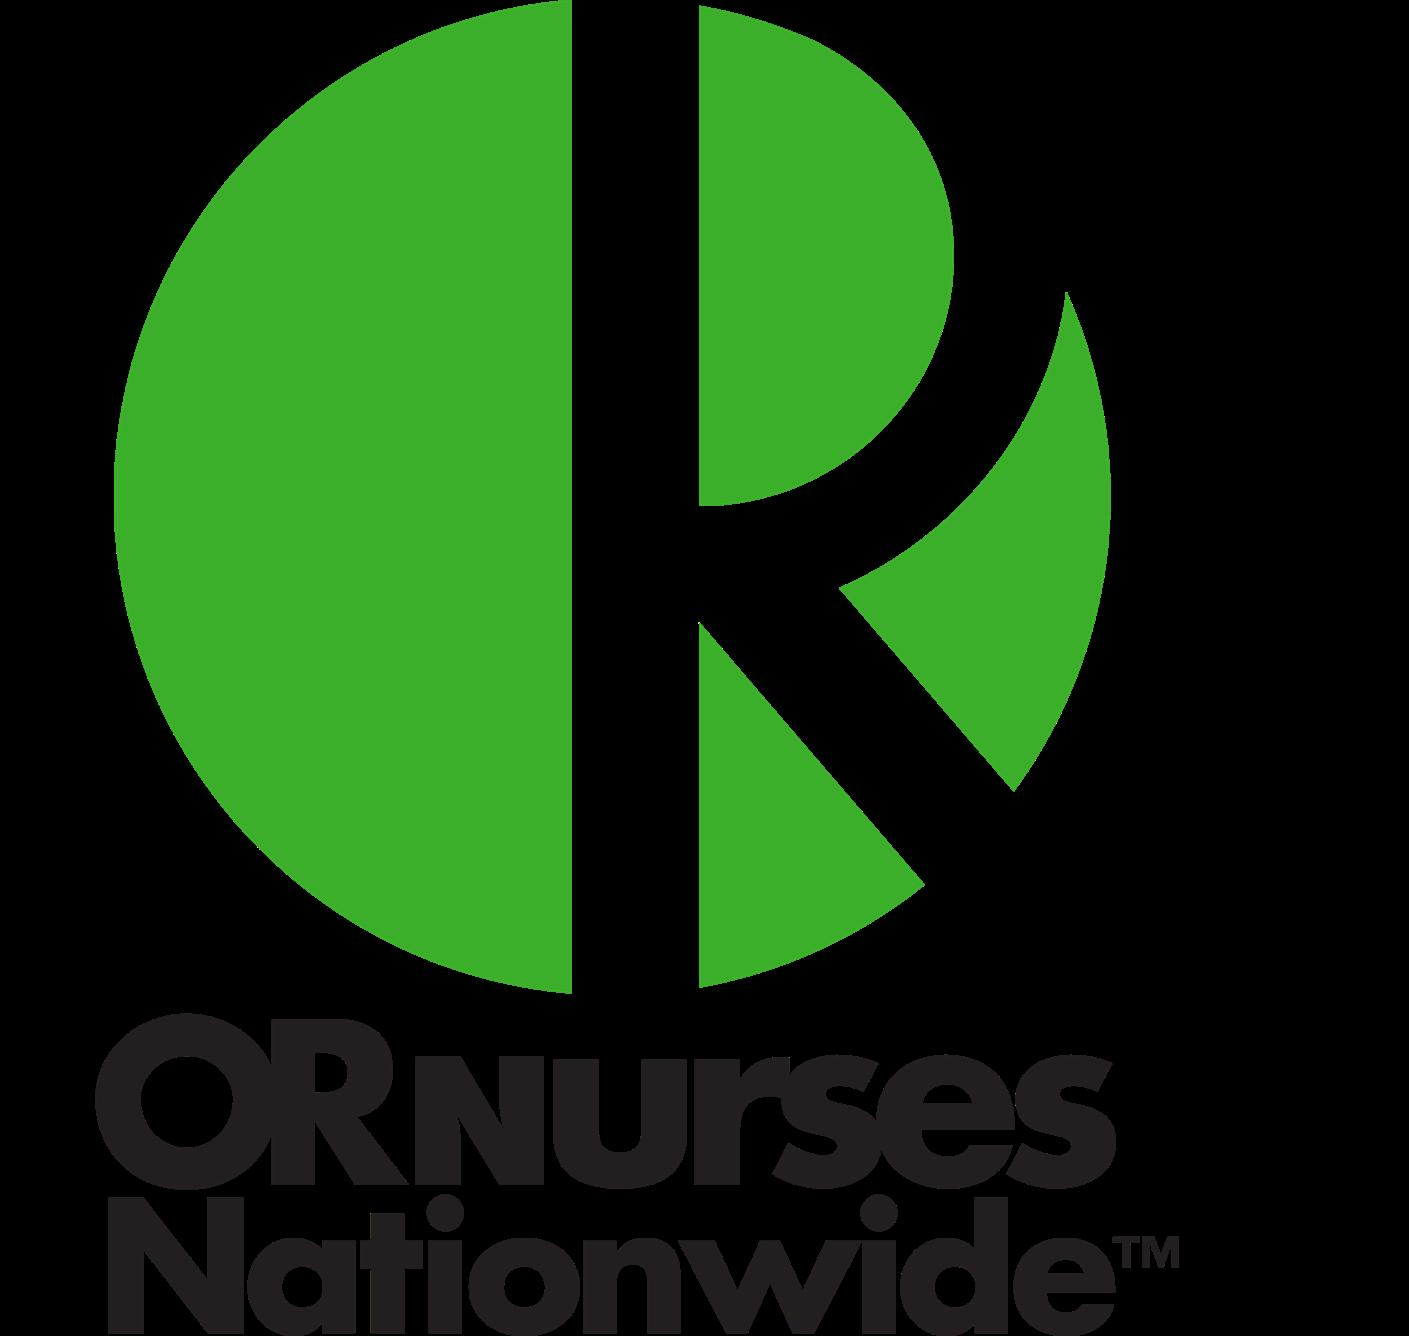 OR Nurses Nationwide - Logo